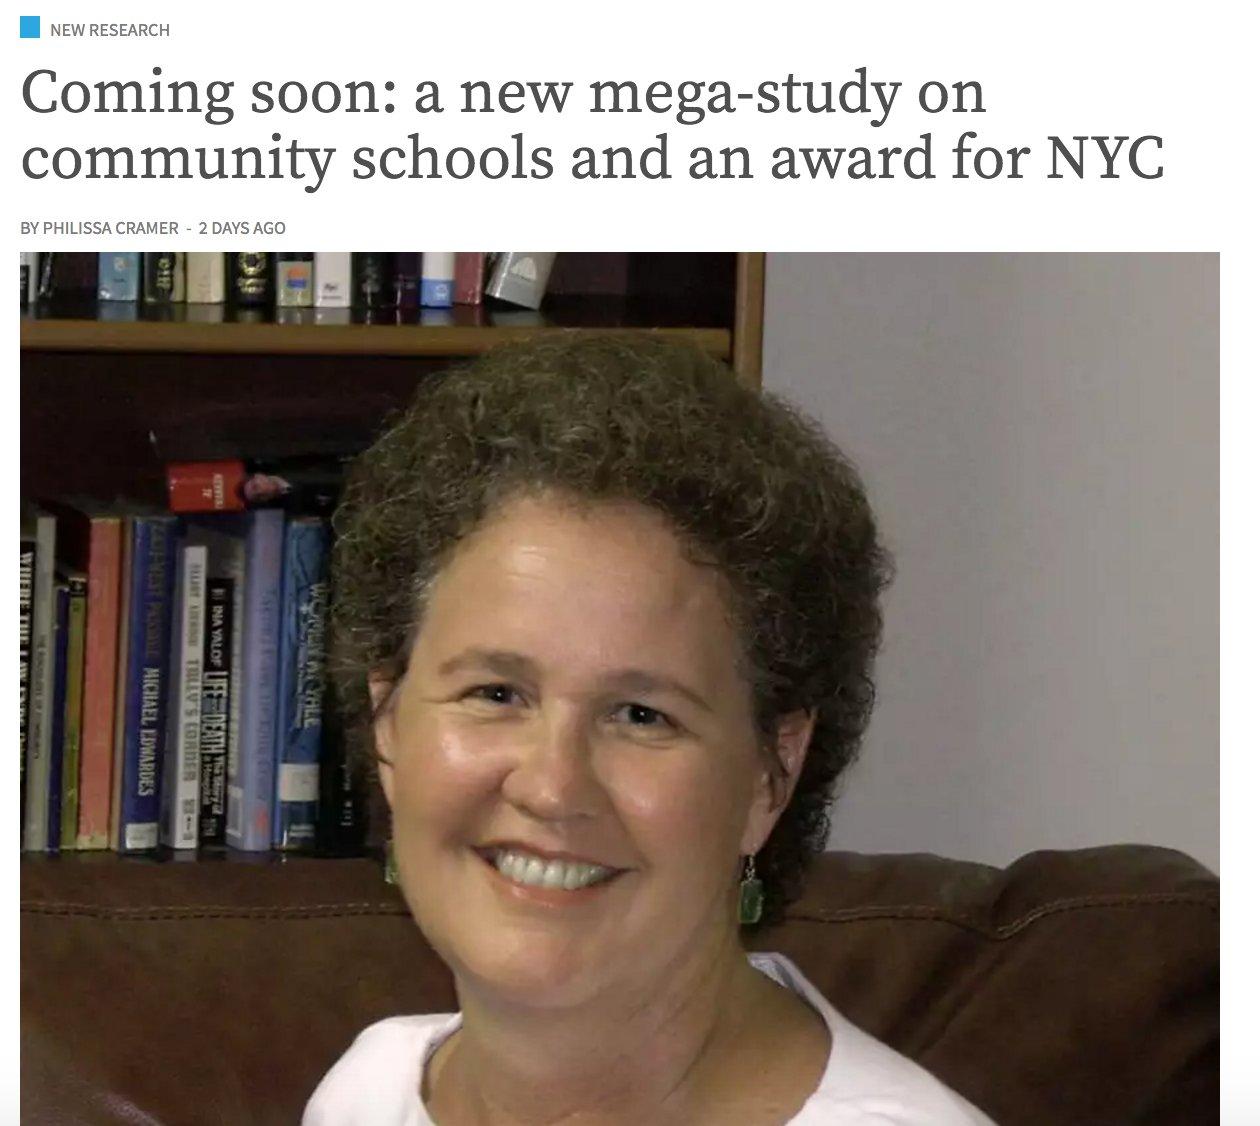 Let's nix the suspense & admit Linda Darling-Hammond's study will make #CommunitySchools look just great: https://t.co/MOK9YpPE6u #edreform https://t.co/l2t9q6Po0L